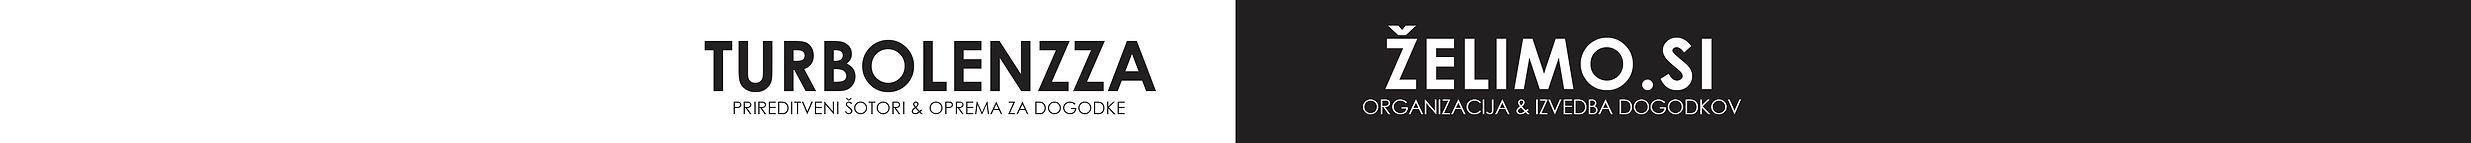 logo TinZ ozek.jpg